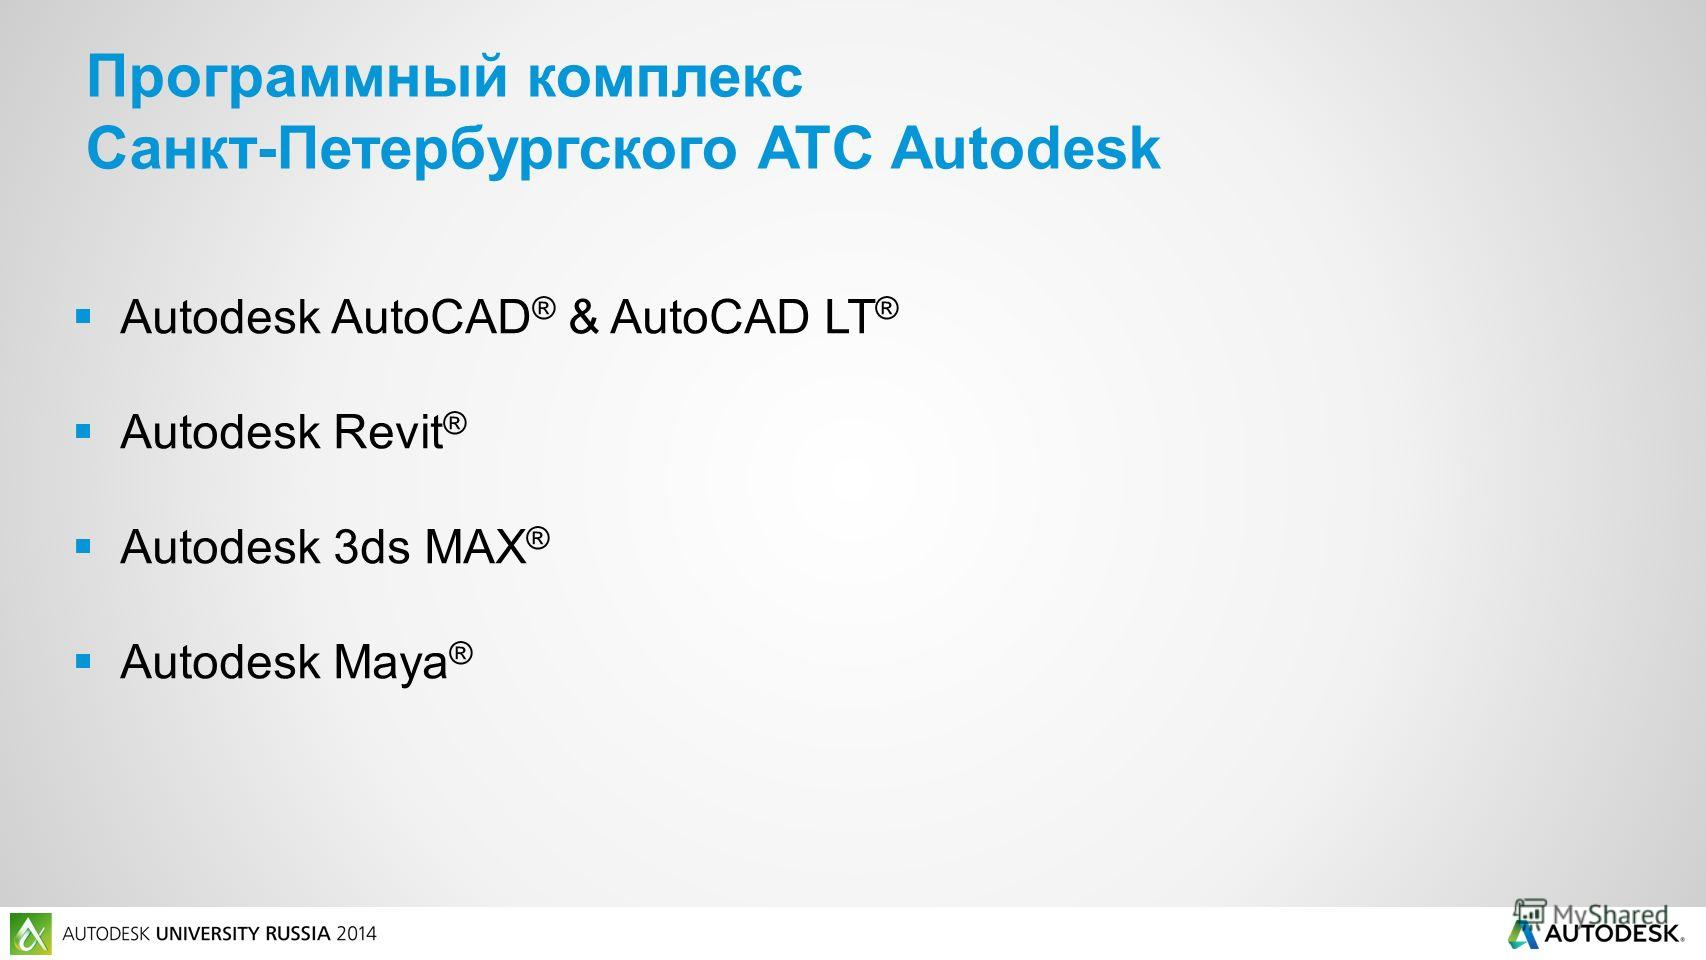 Autodesk AutoCAD ® & AutoCAD LT ® Autodesk Revit ® Autodesk 3ds MAX ® Autodesk Maya ® Программный комплекс Санкт-Петербургского ATC Autodesk